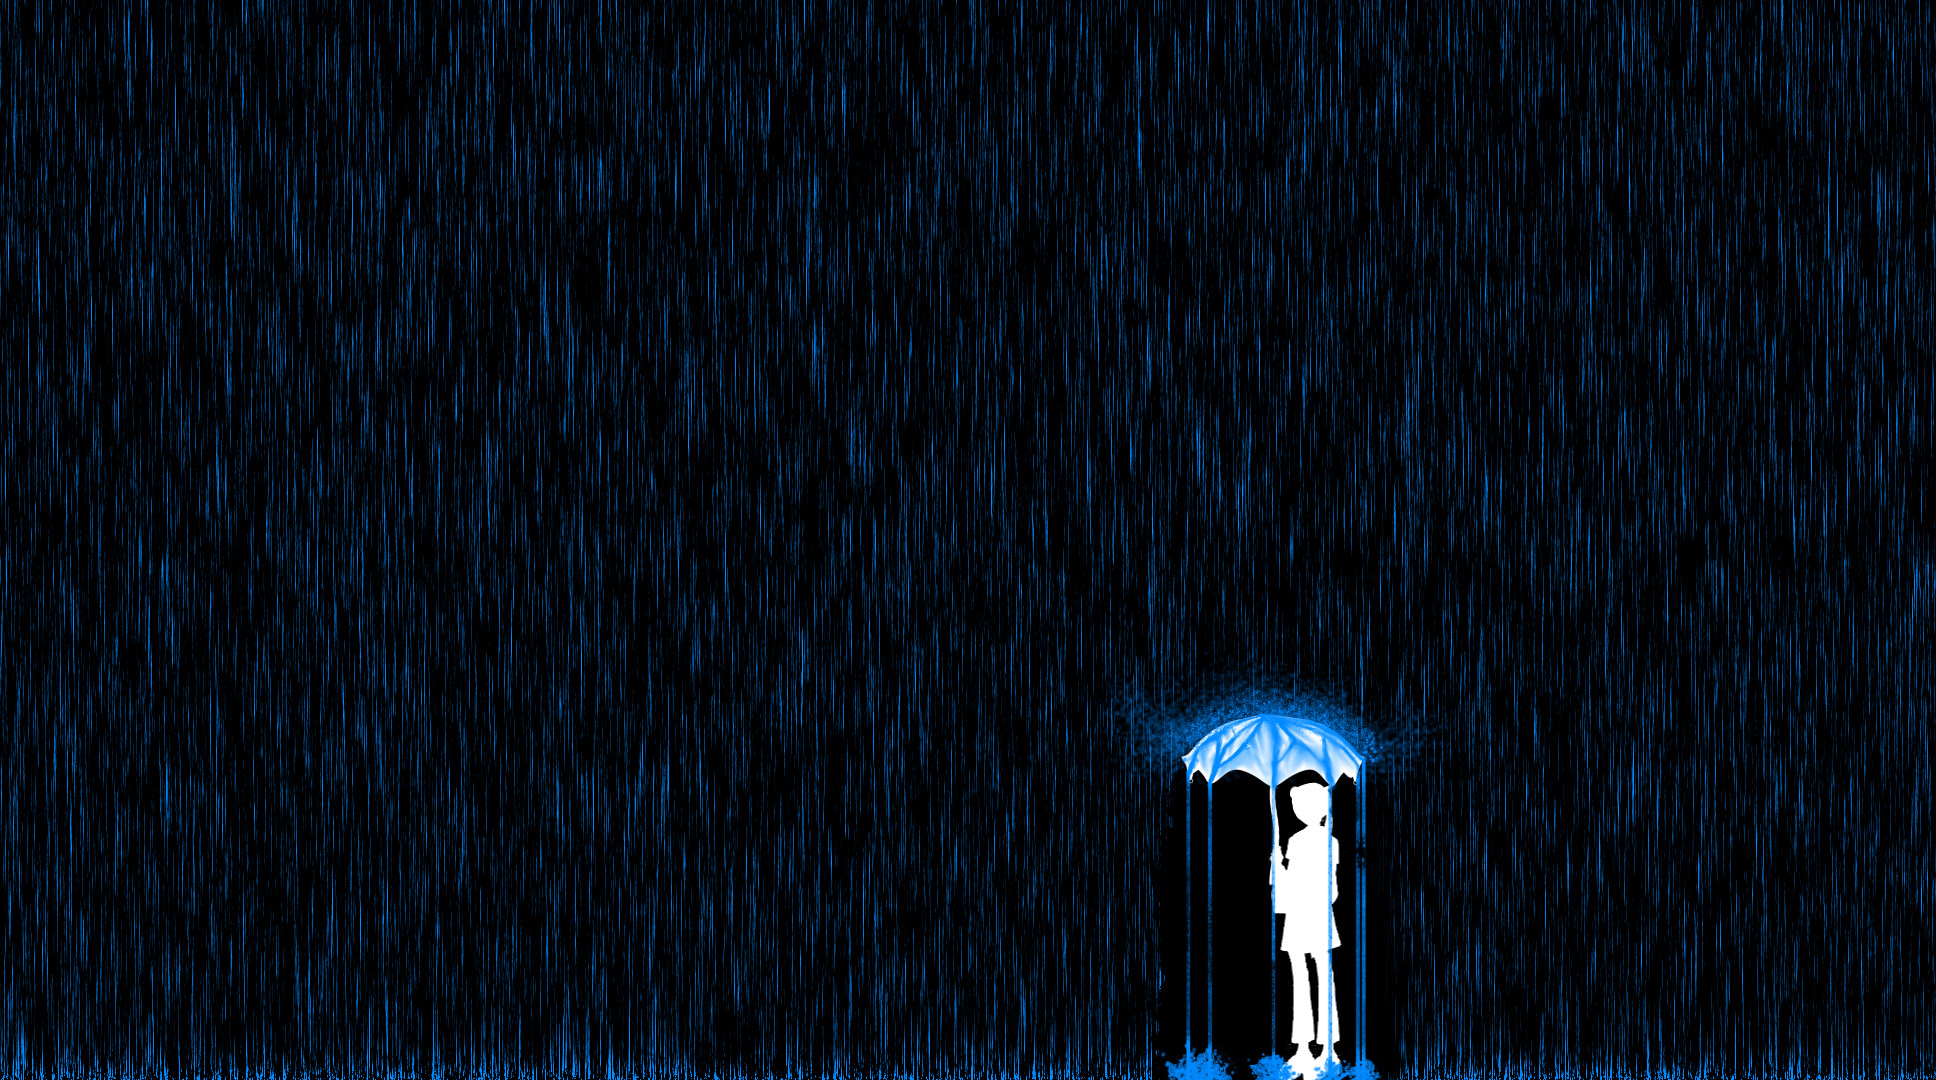 Rainy Day Wallpaper HD WALLPAPERS ZONE Rainy HD Beautiful